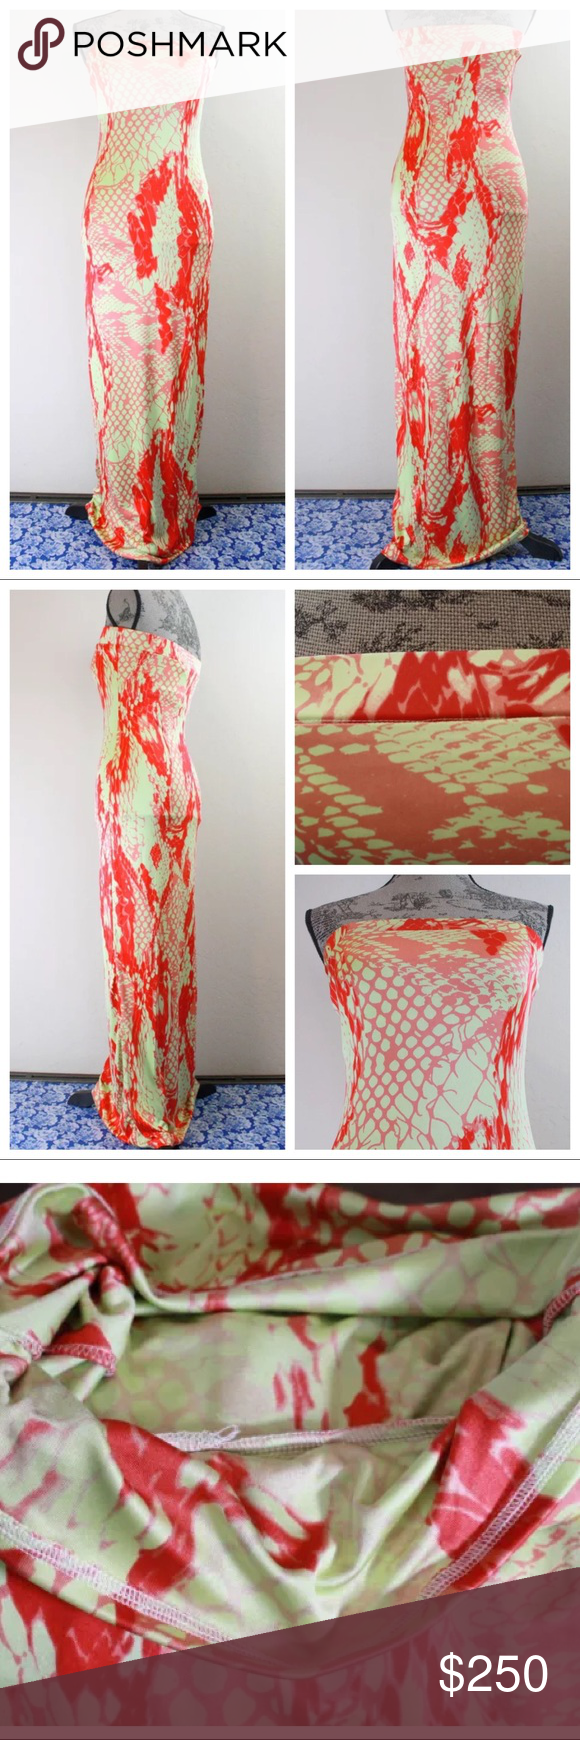 a9fcfd24e5c HALE BOB Snakeskin Stretch Silk Maxi Tube Dress Printed Stretch Silk  Strapless Maxi Dress • Snakeskin Print • Strapless • Built-in Bandeau Bra •  Pull Over ...